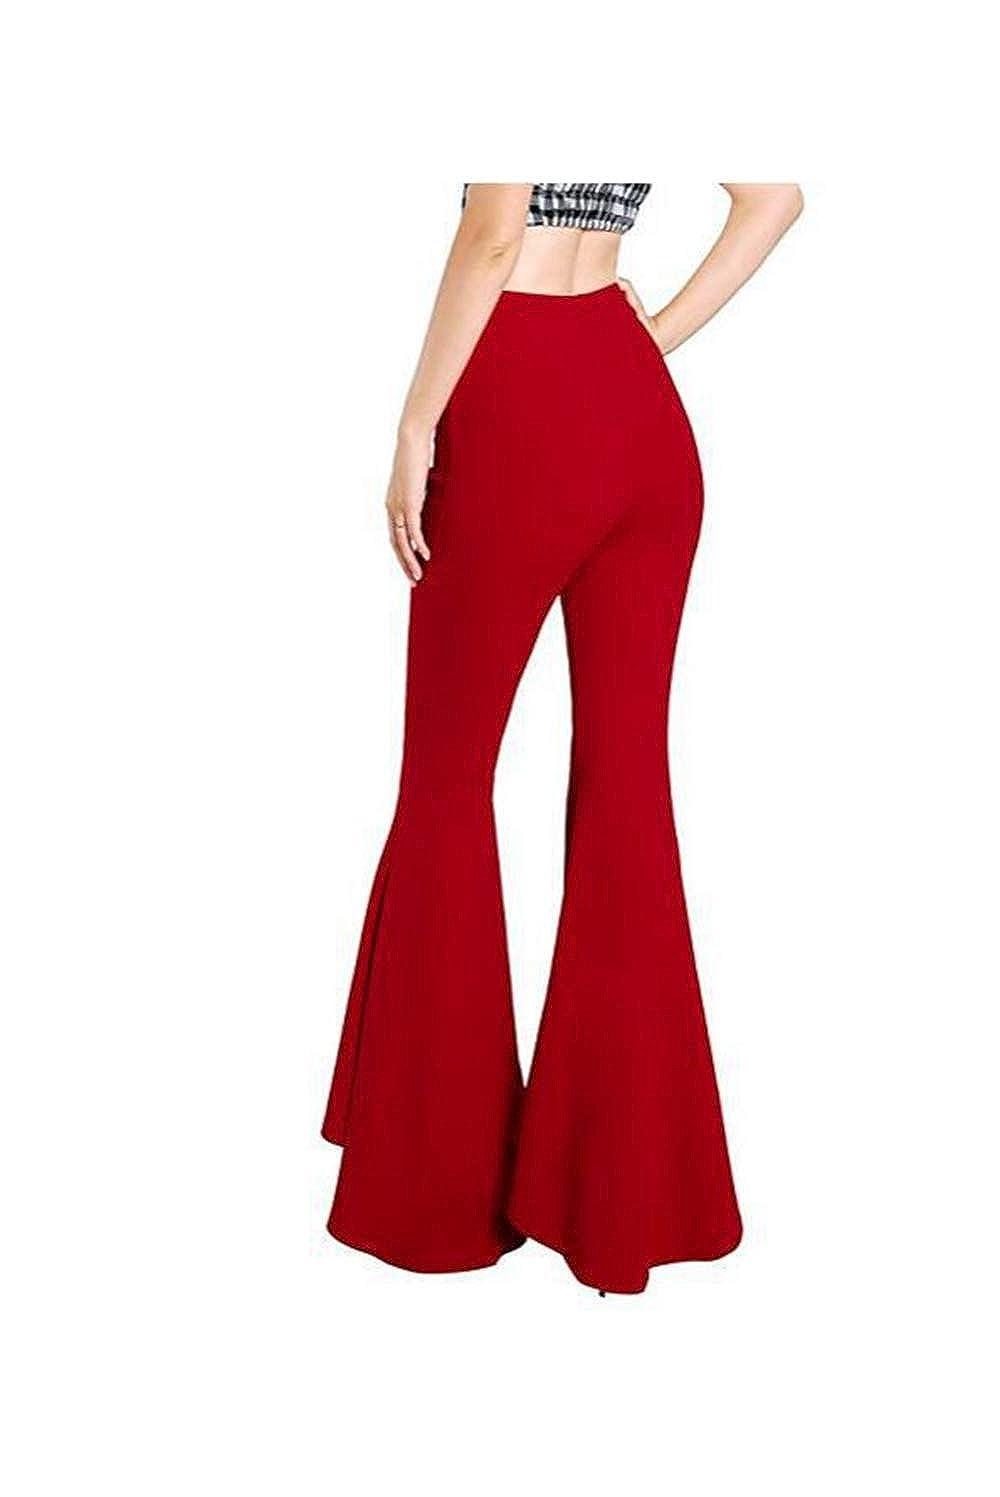 Trousers Women High Waist Bell Bottom Pants Flare Wide Leg Big Plus Size 3XL